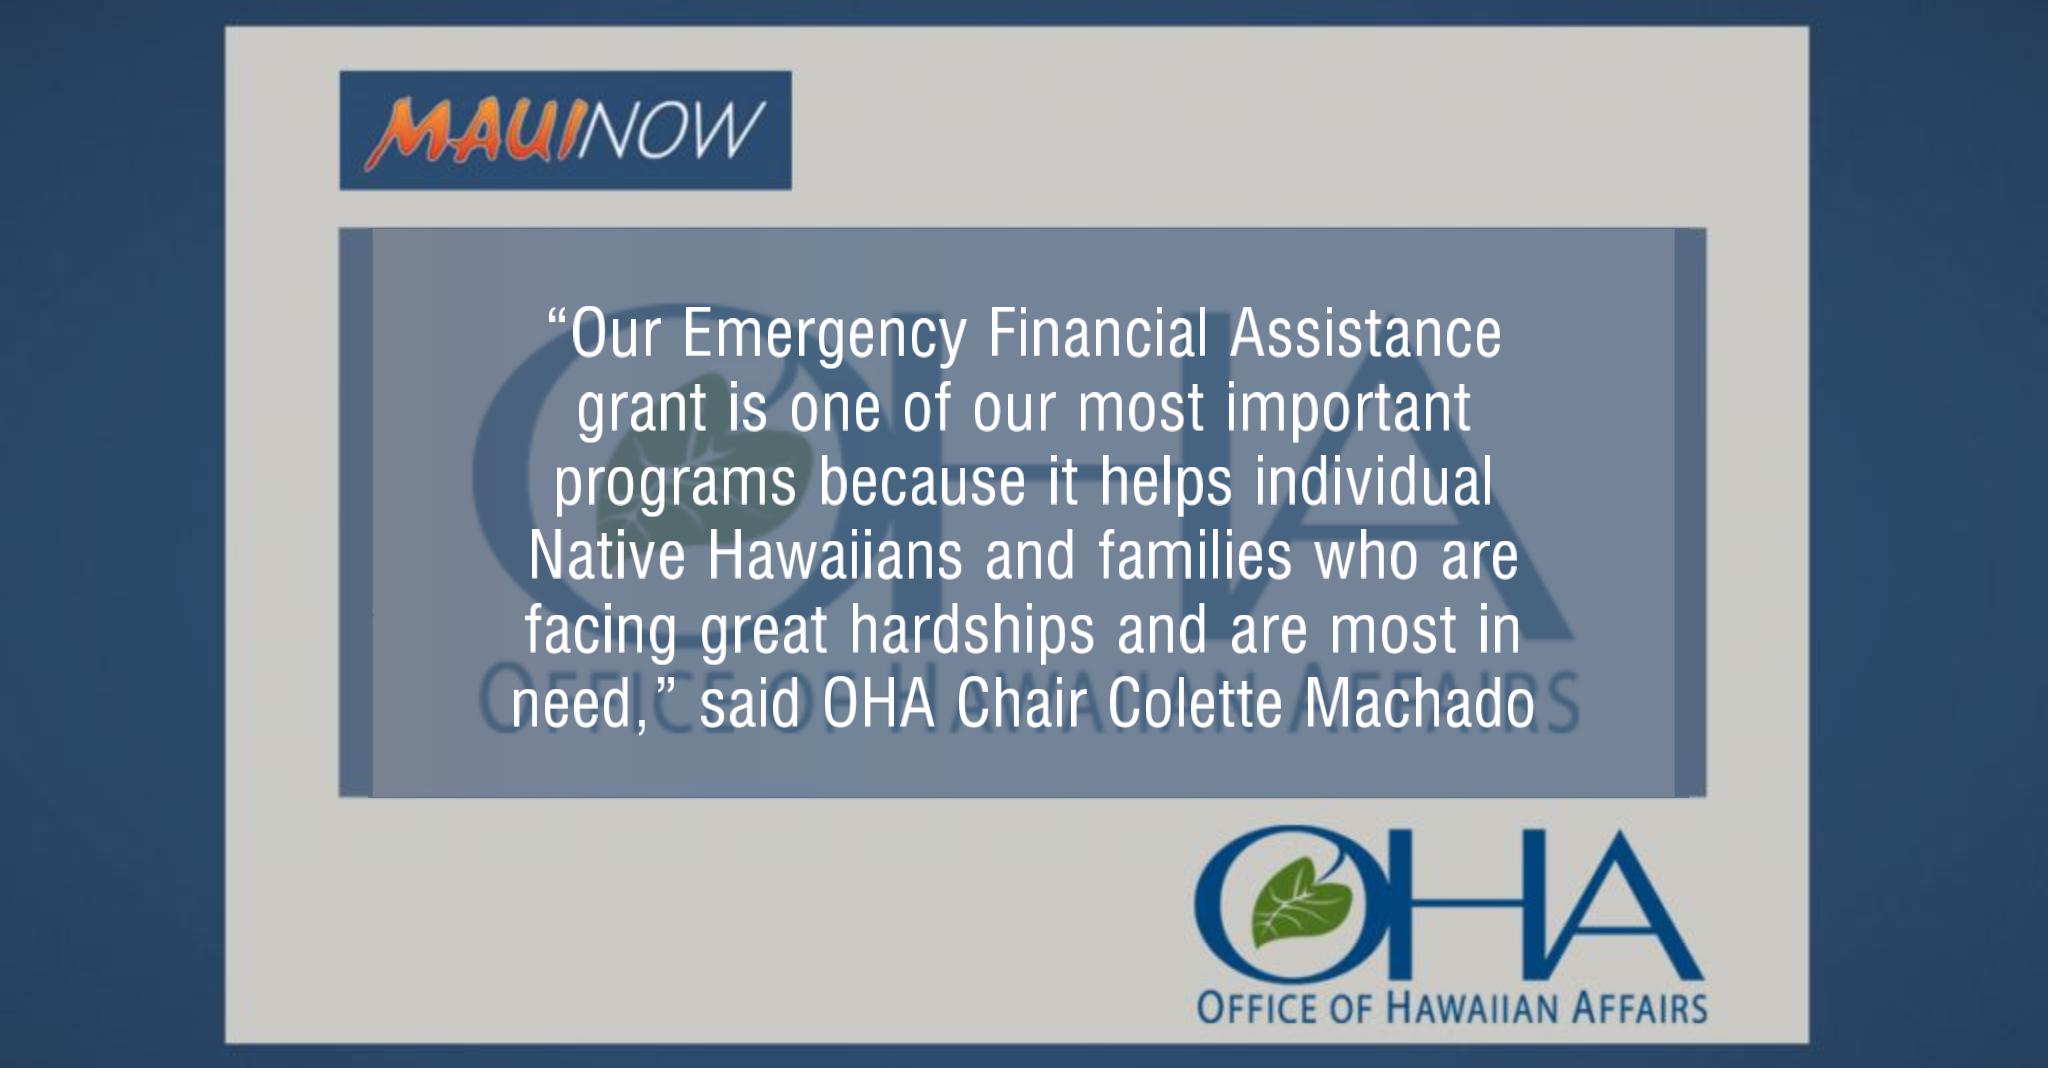 OHA Seeks Nonprofit for $1.66 Million Grant